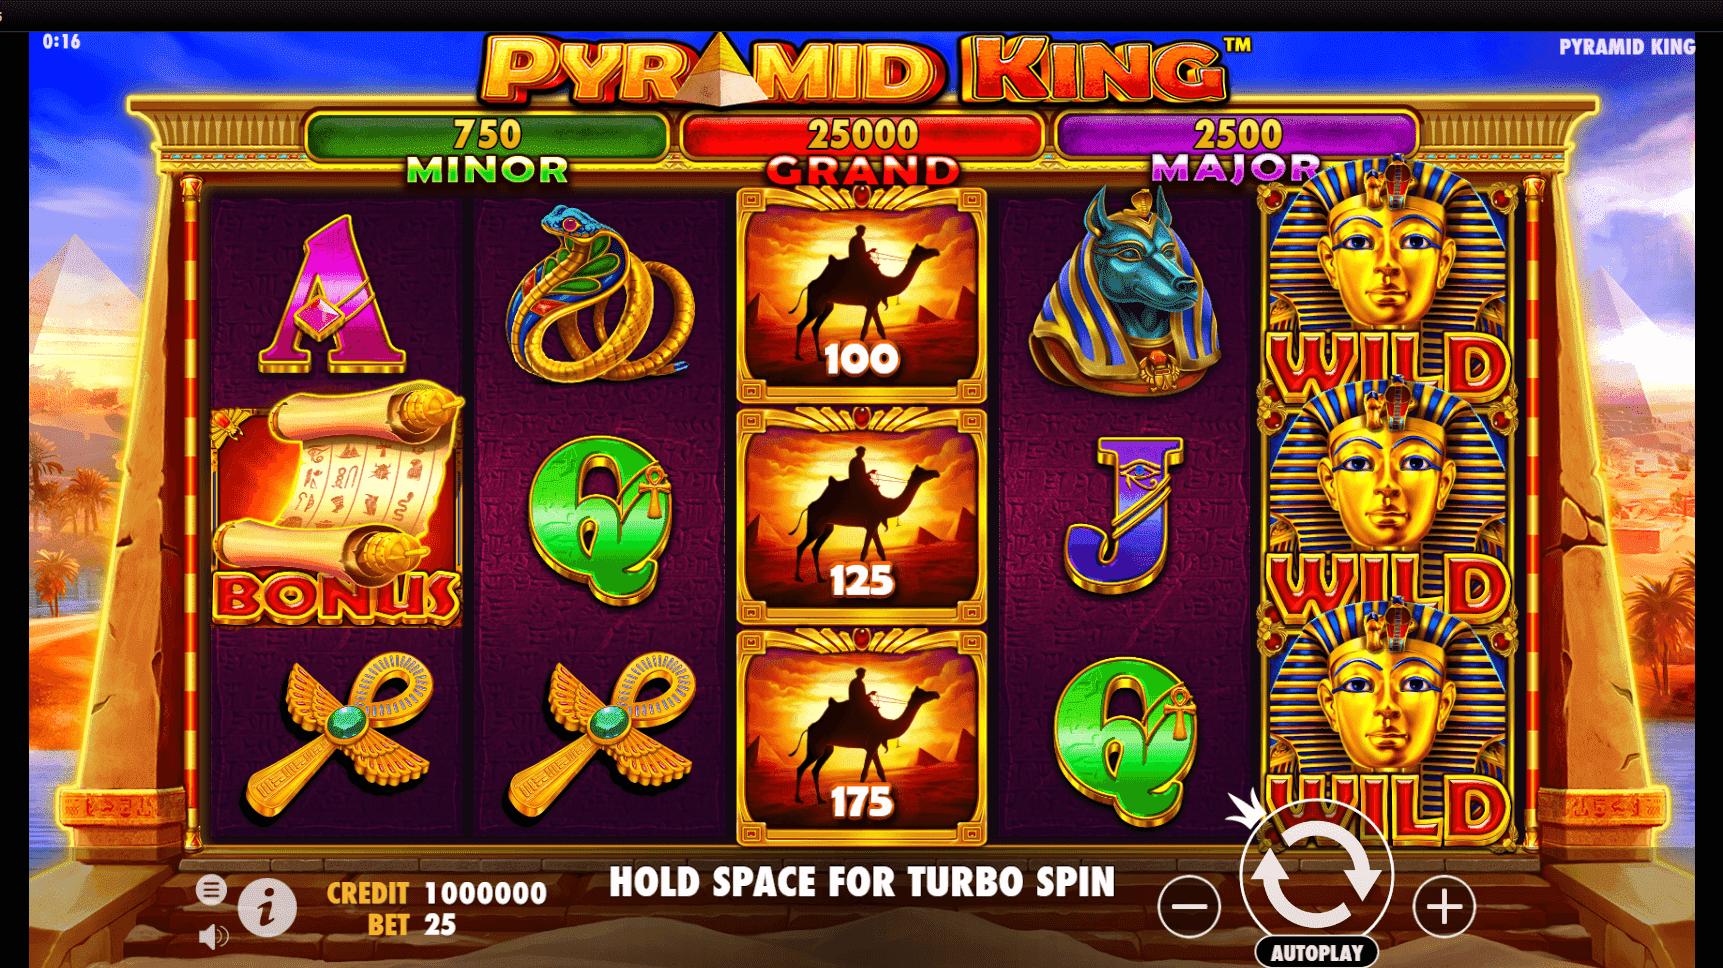 Pyramid King slot machine screenshot